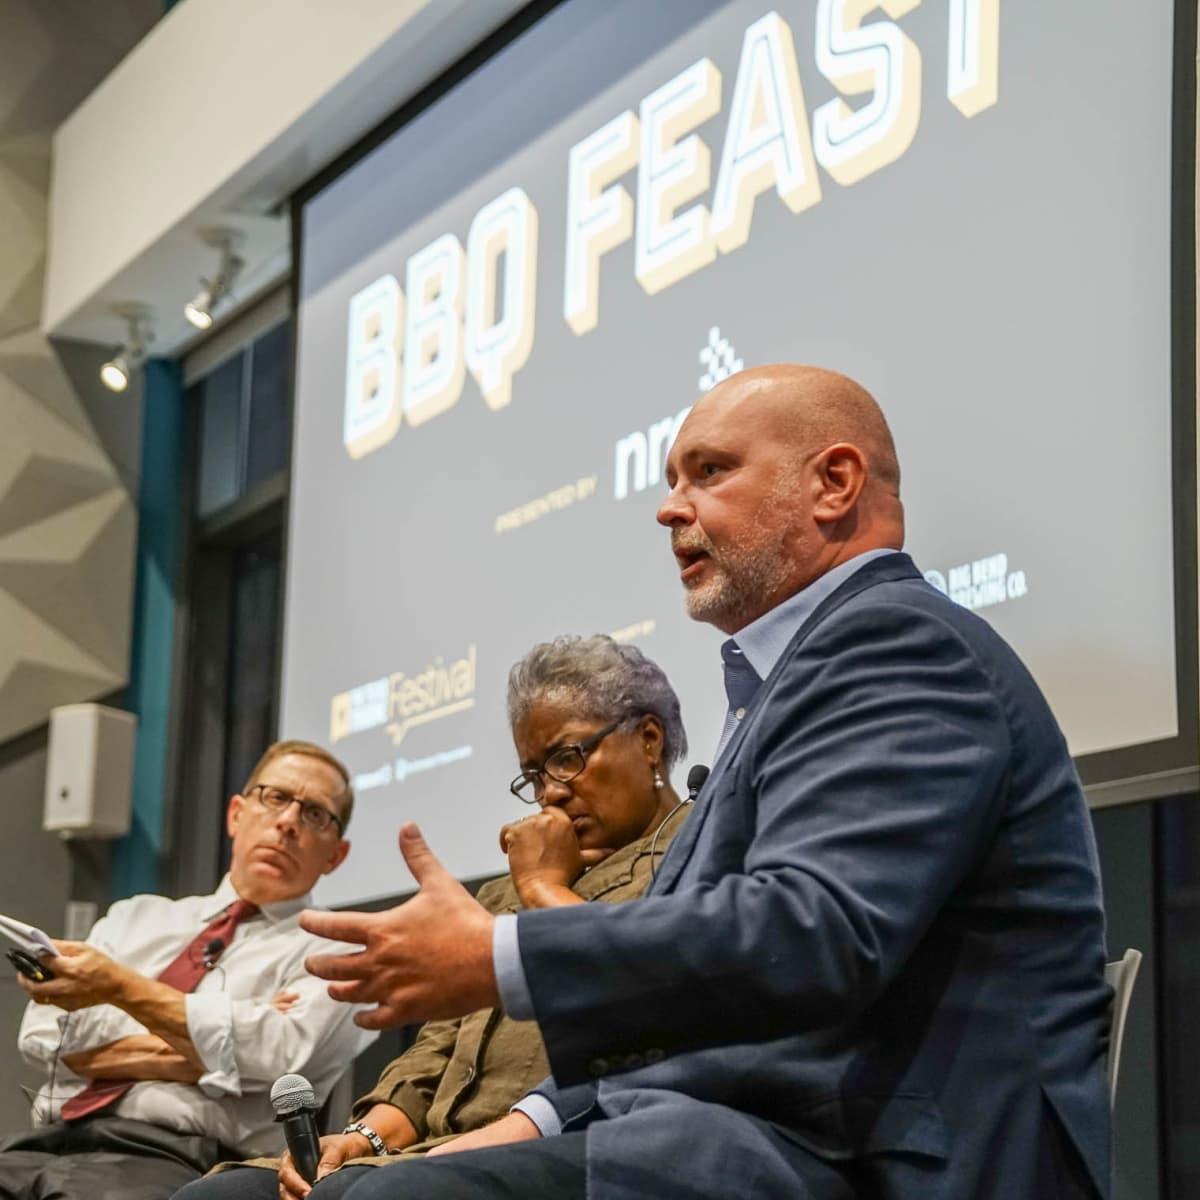 Texas Tribune Festival 2017 BBQ Feast at Google Evan Smith Donna Brazile Steve Schmidt